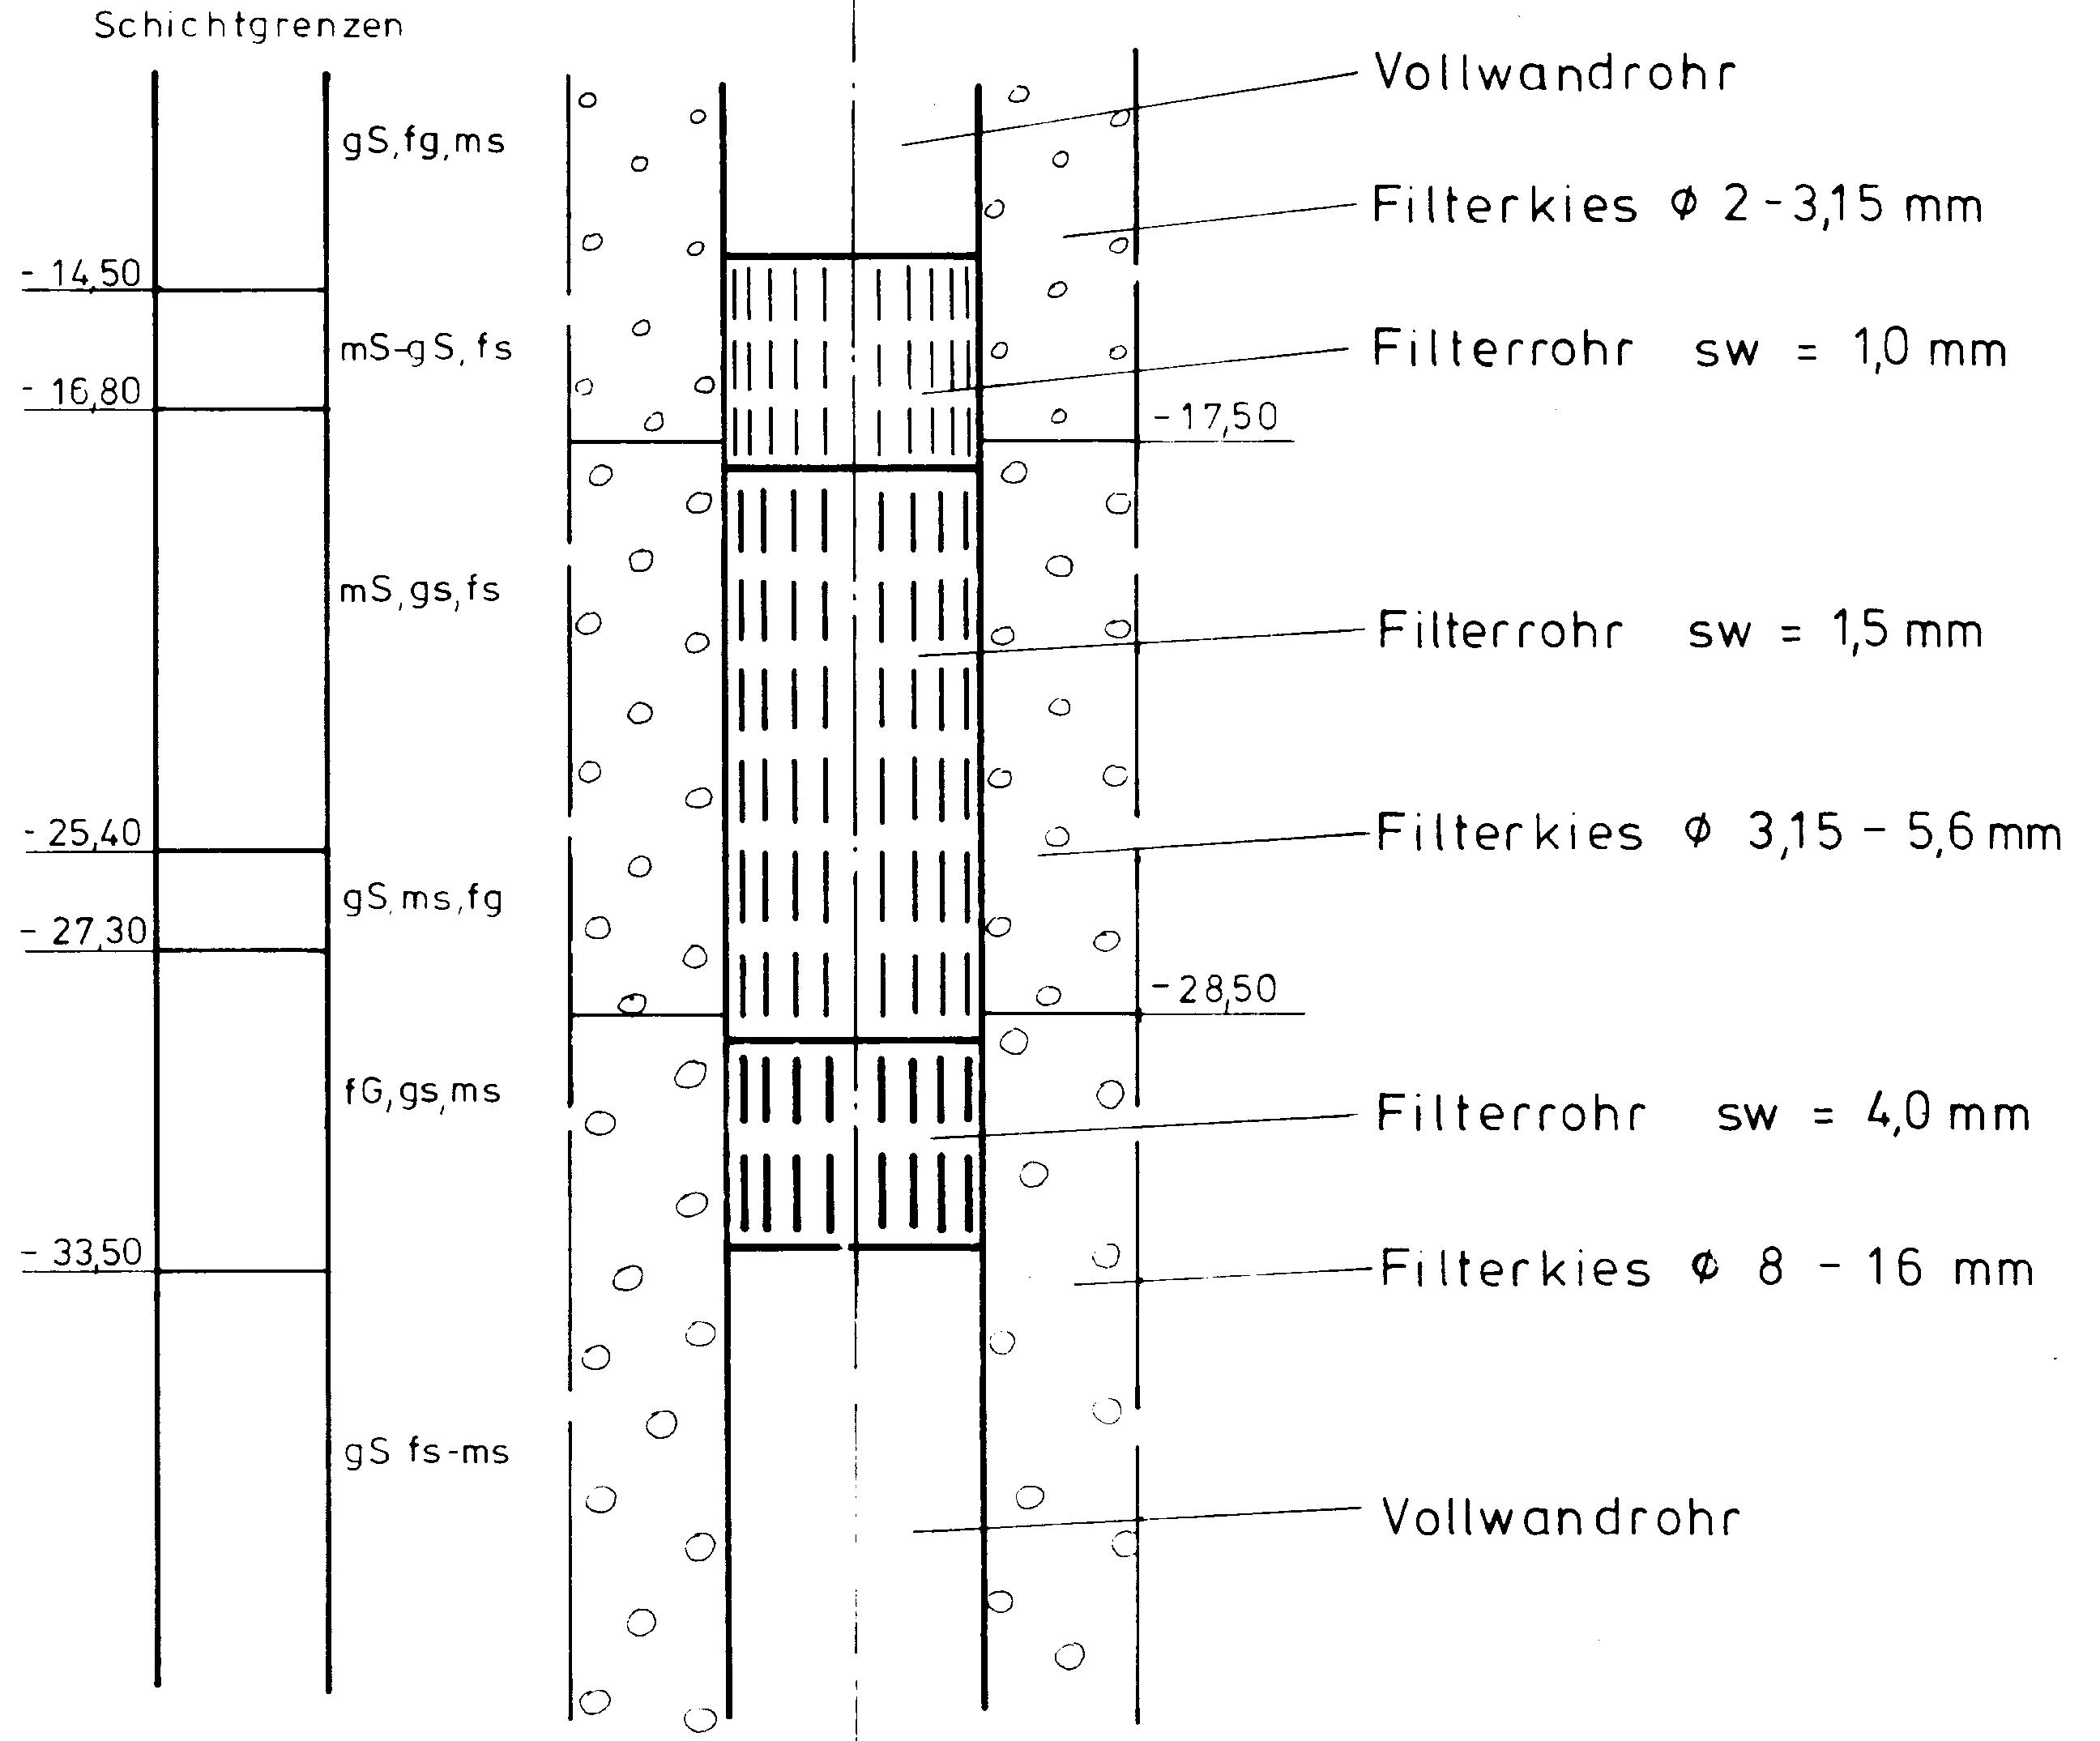 Filterkies Brunnen.Grundwasser Brunnenausbau